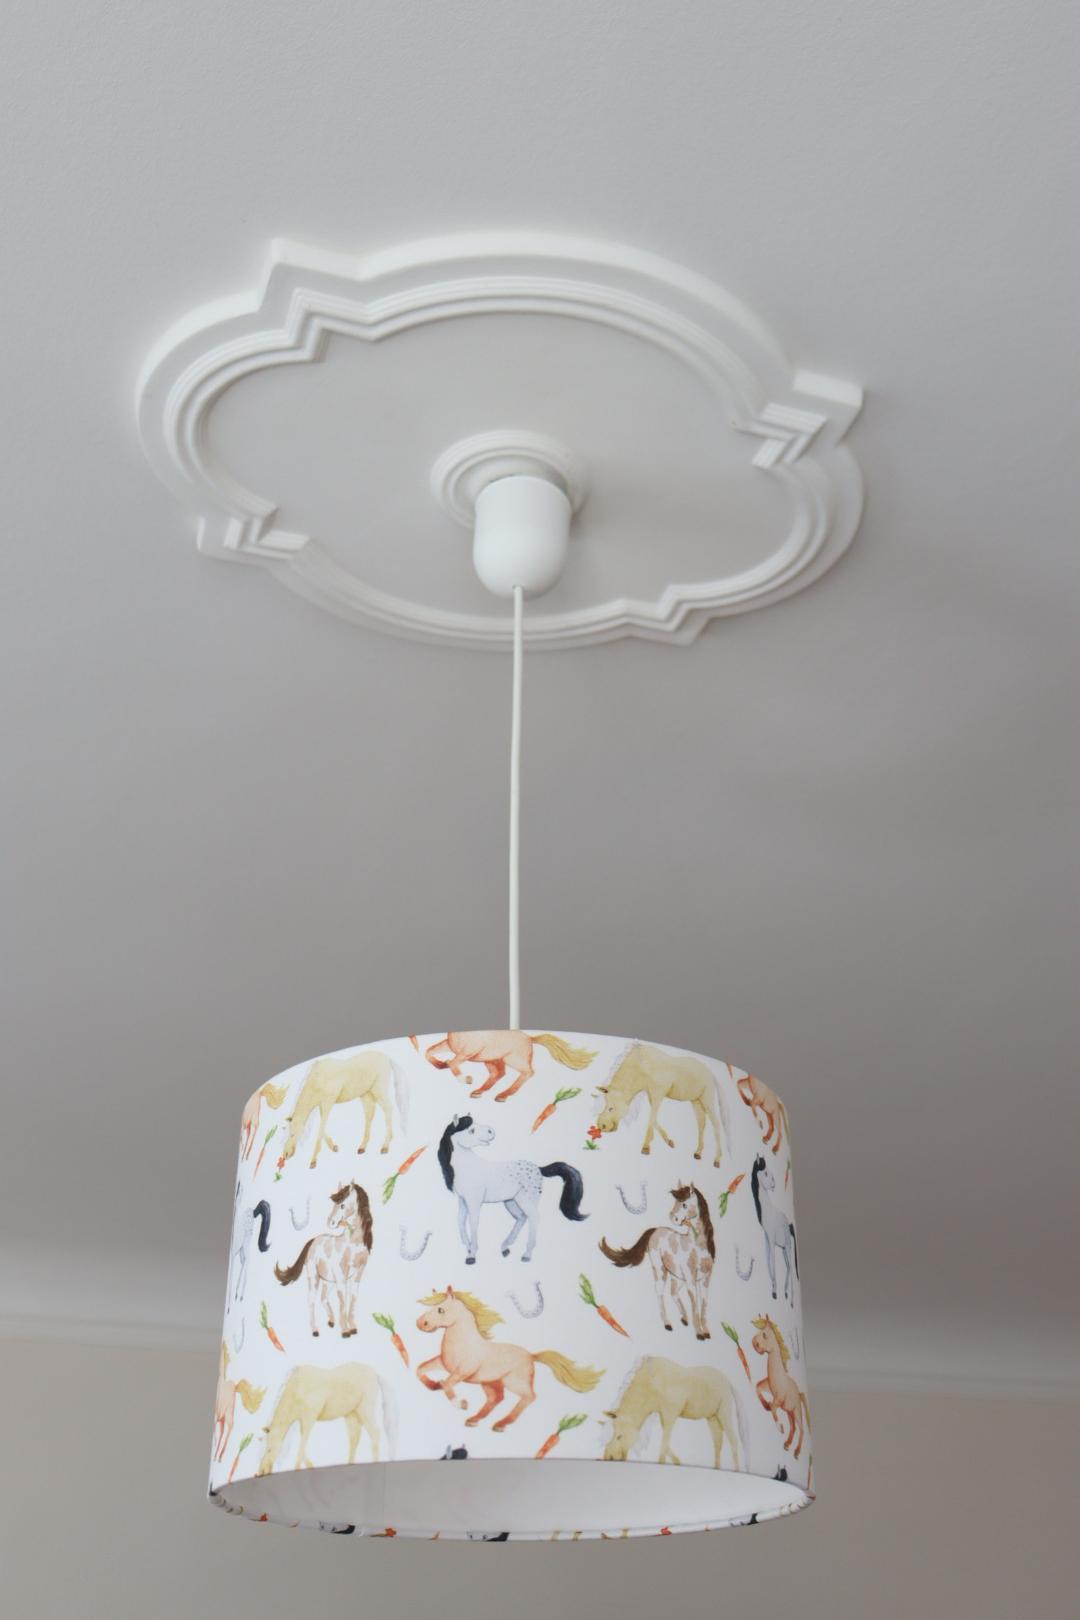 Full Size of Lampe Kinderzimmer Lampenschirm Mdchen Kinderlampe Pferde Regal Weiß Regale Sofa Kinderzimmer Kinderzimmer Pferd